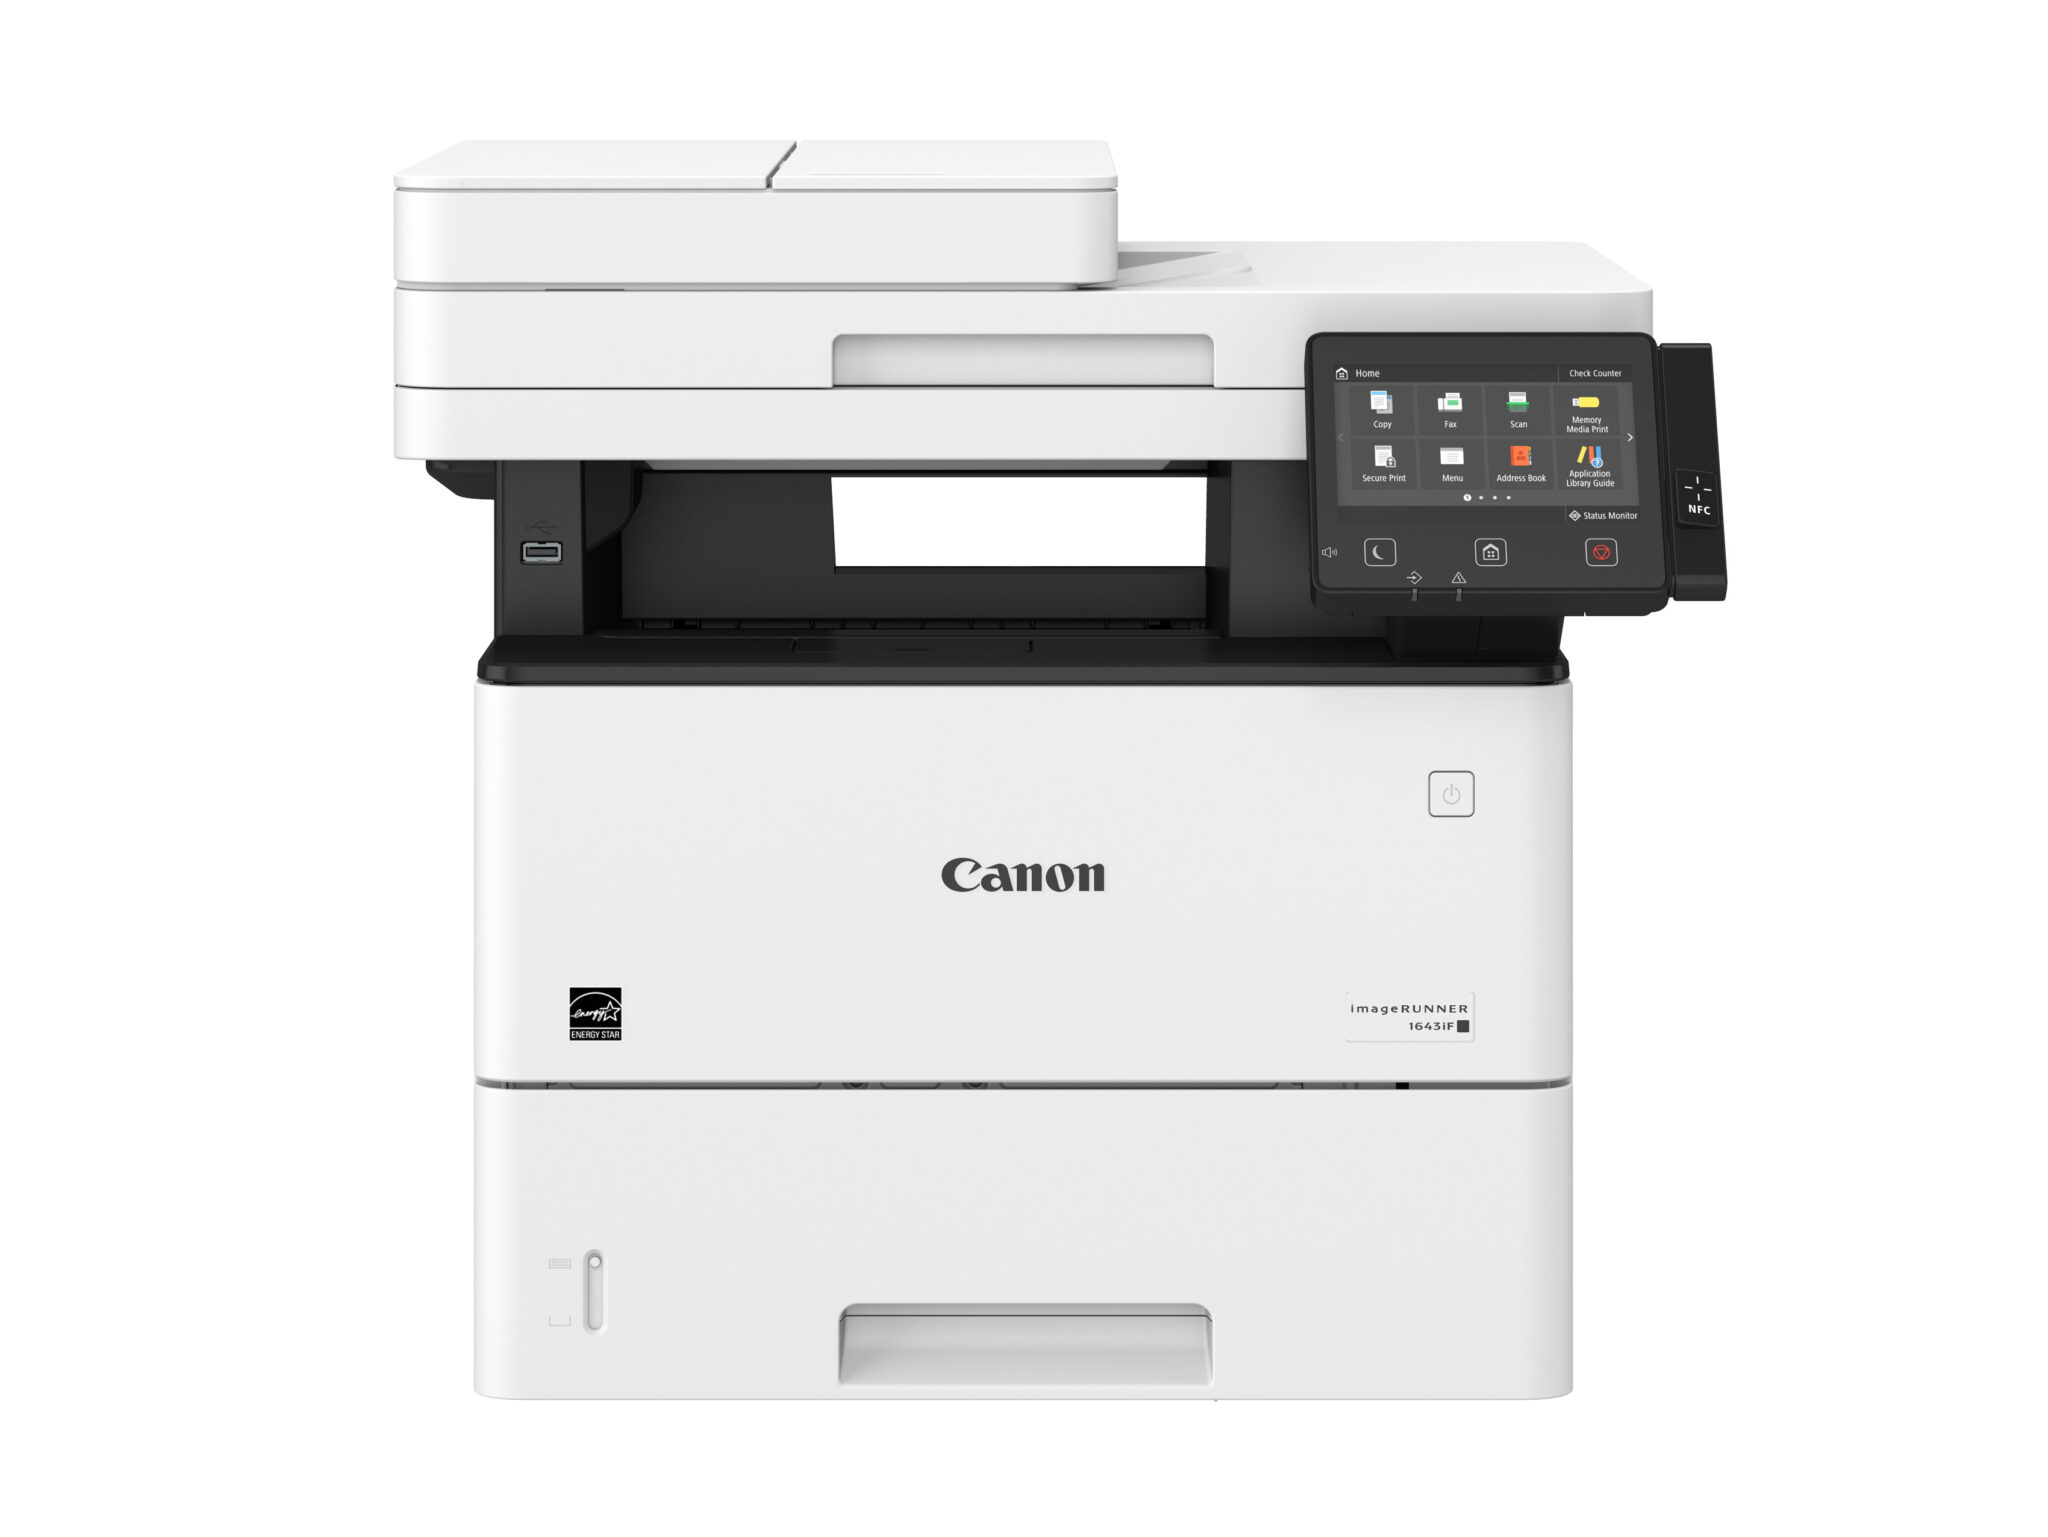 Canon imageRUNNER 1400 series